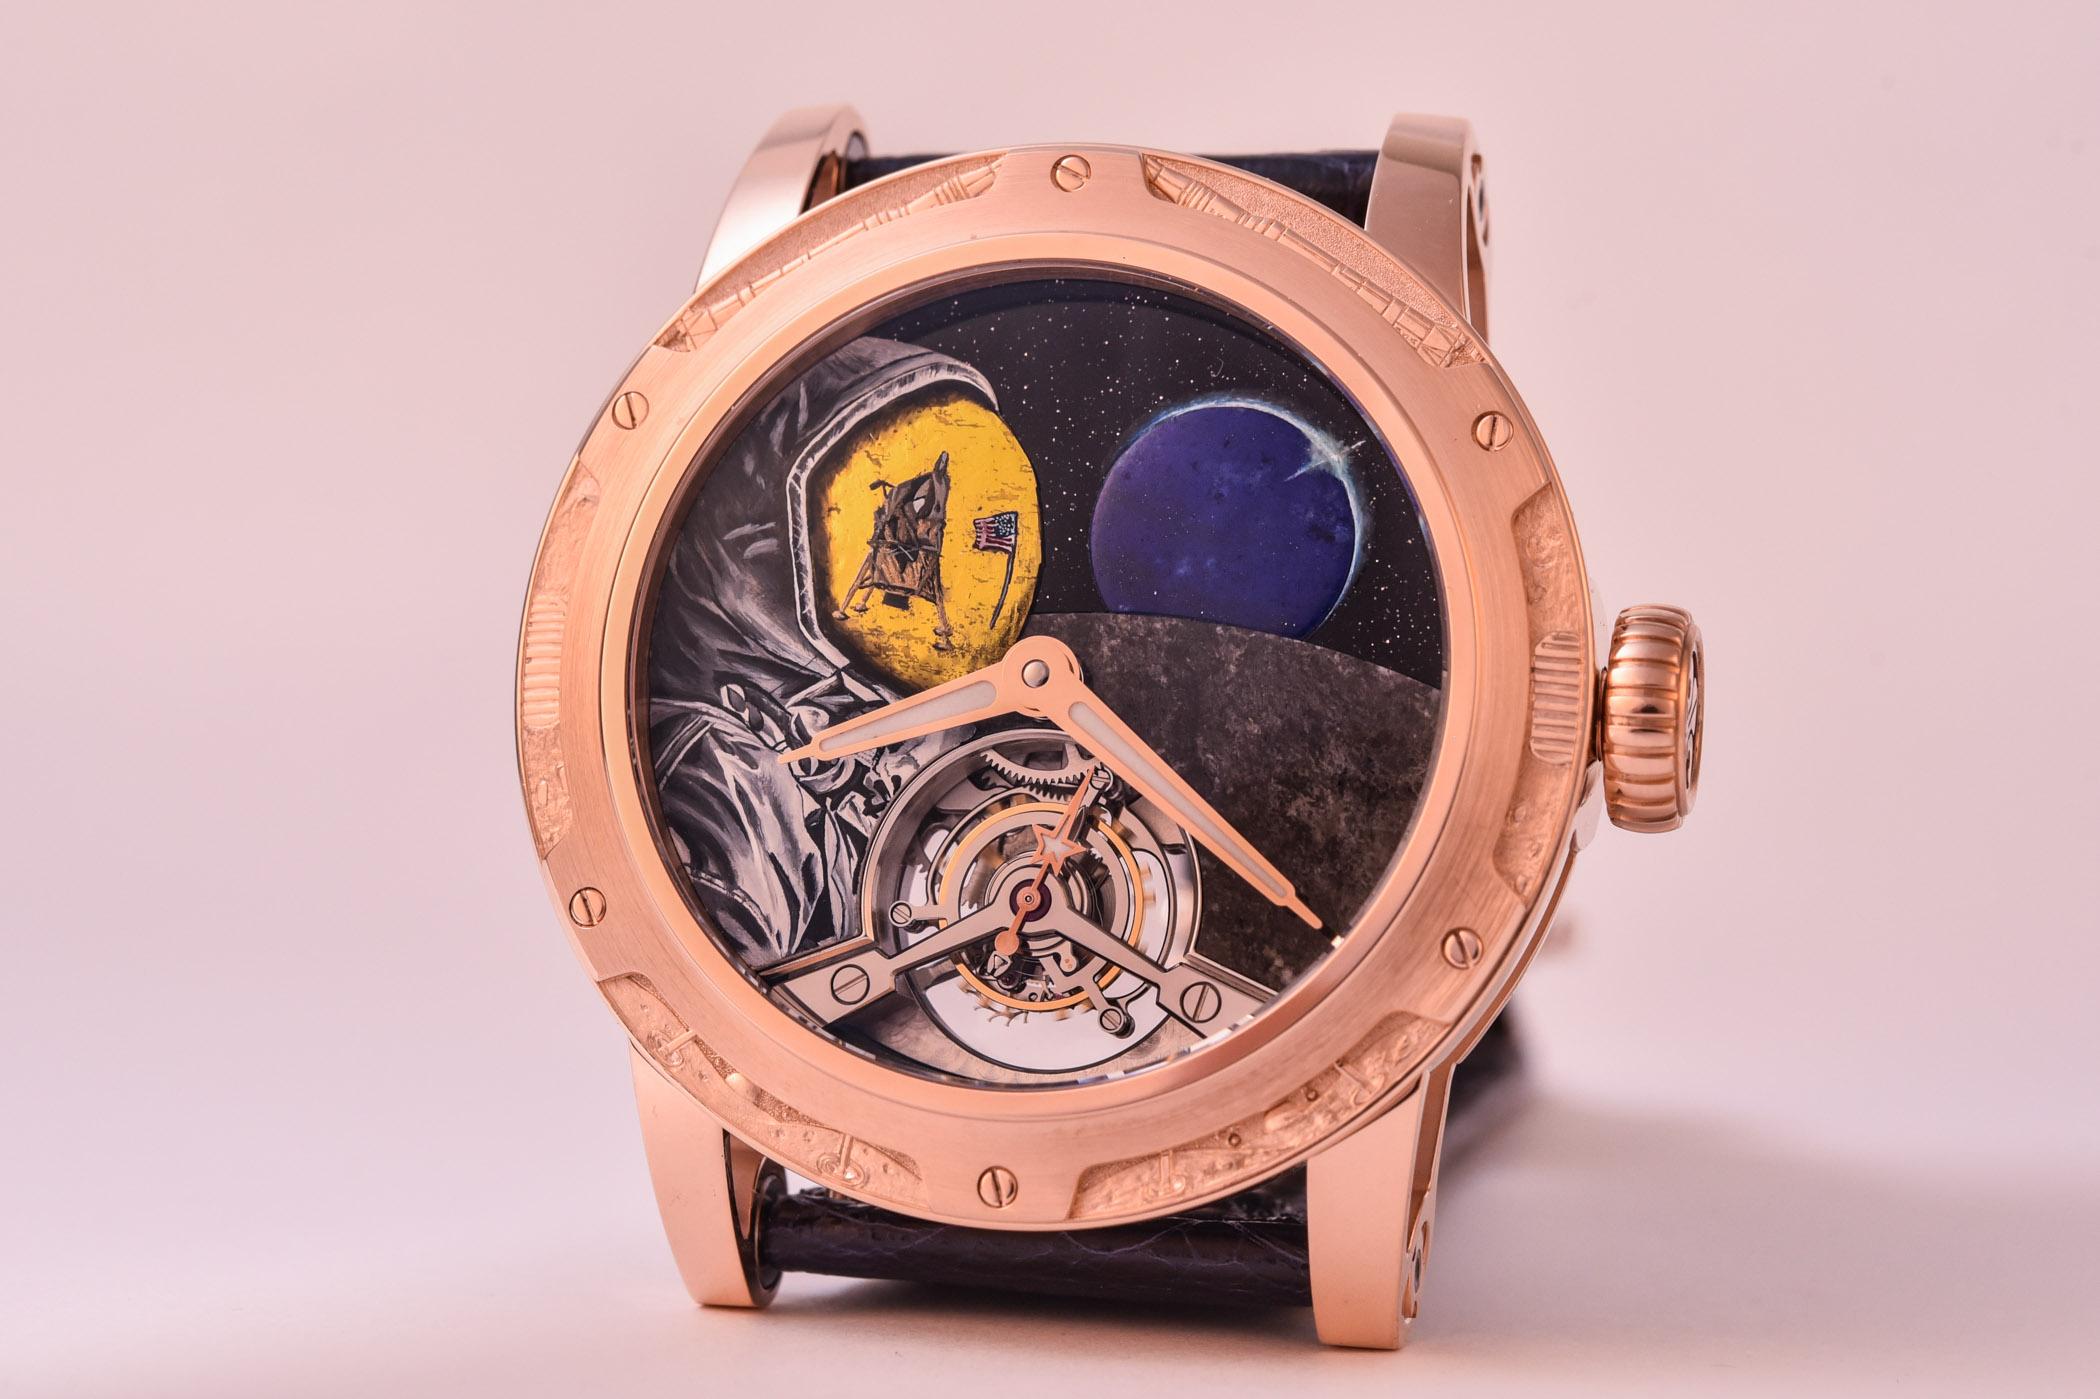 Louis Moinet Moon Race Set of Tourbillon Watches